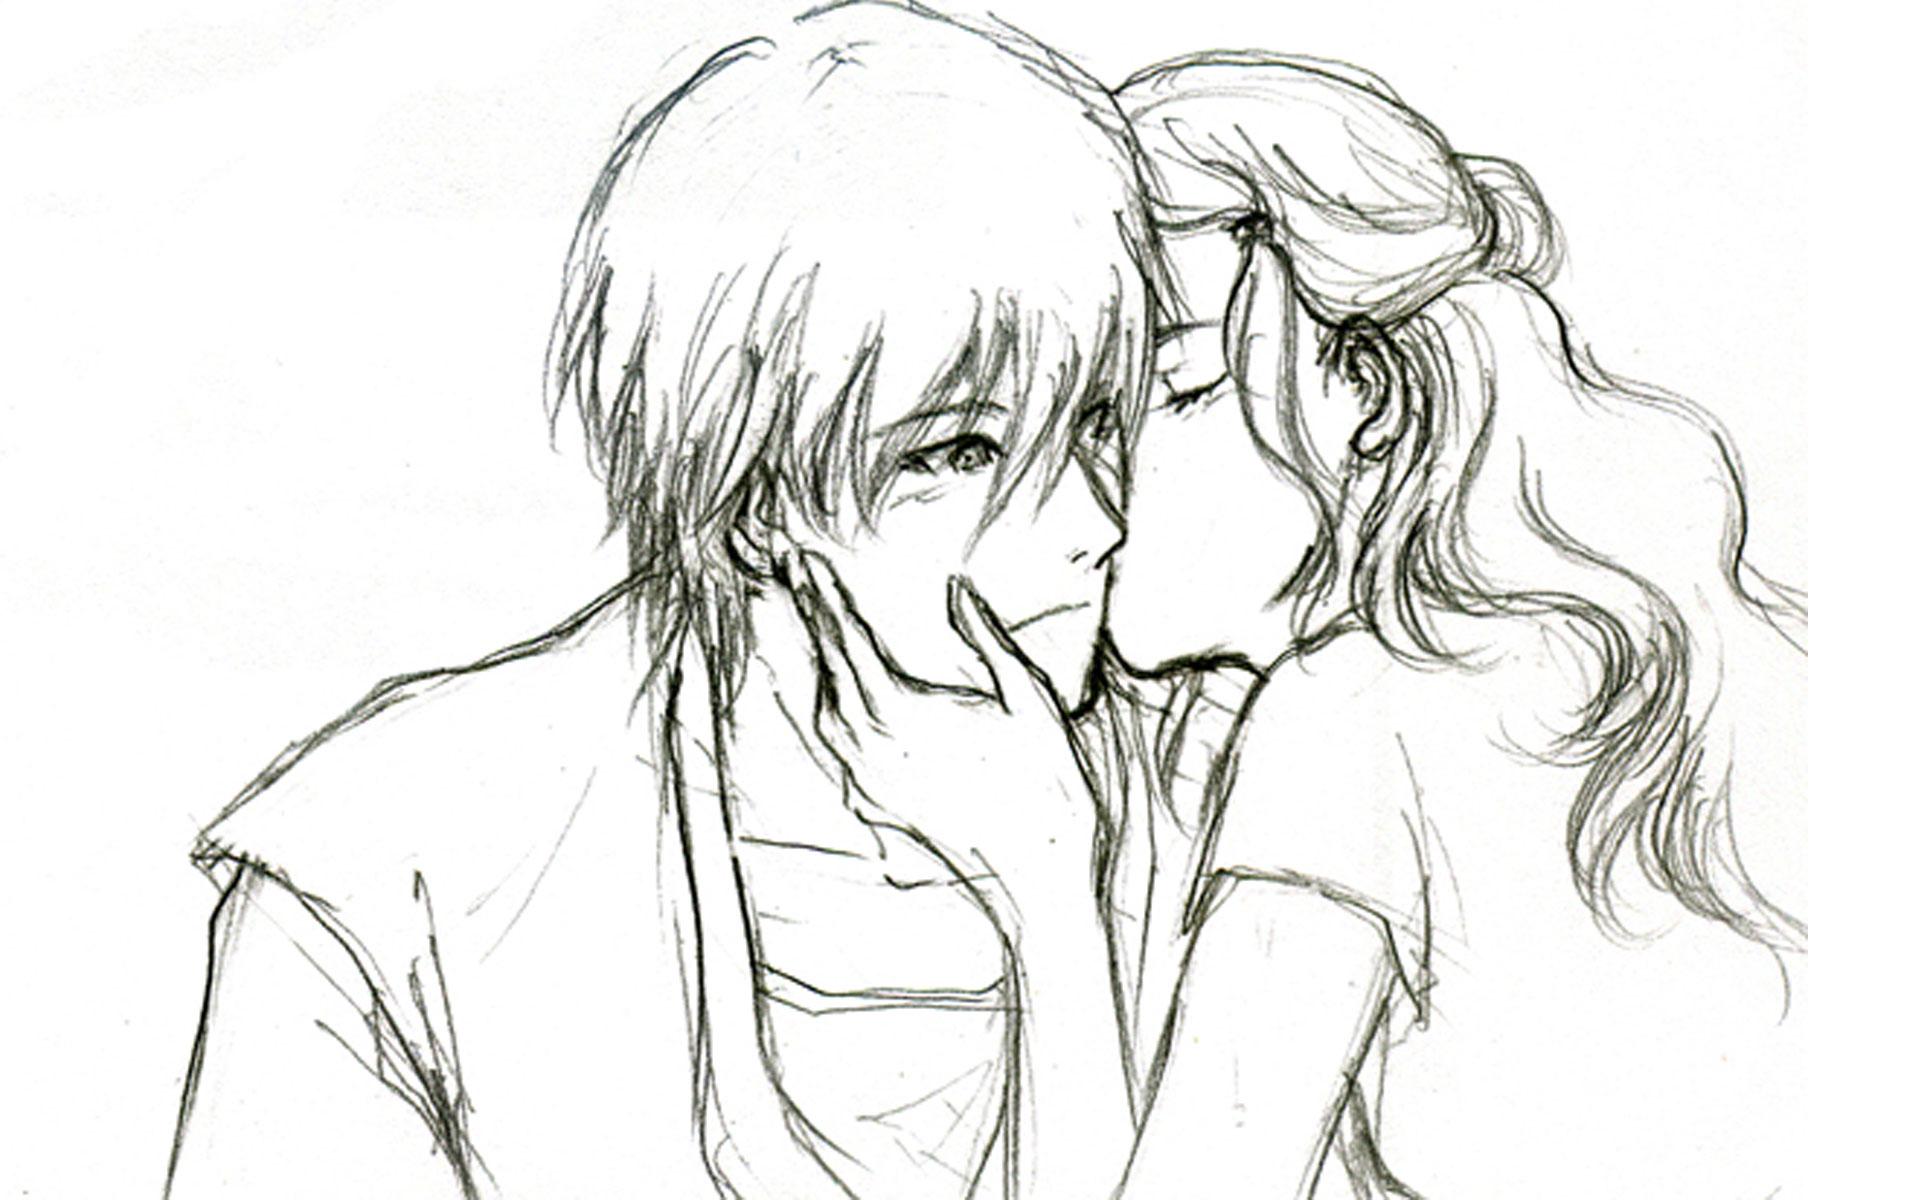 1920x1200 Pencil Scratch Drawing Of Lover Cute Love Drawings Pencil Art Hd